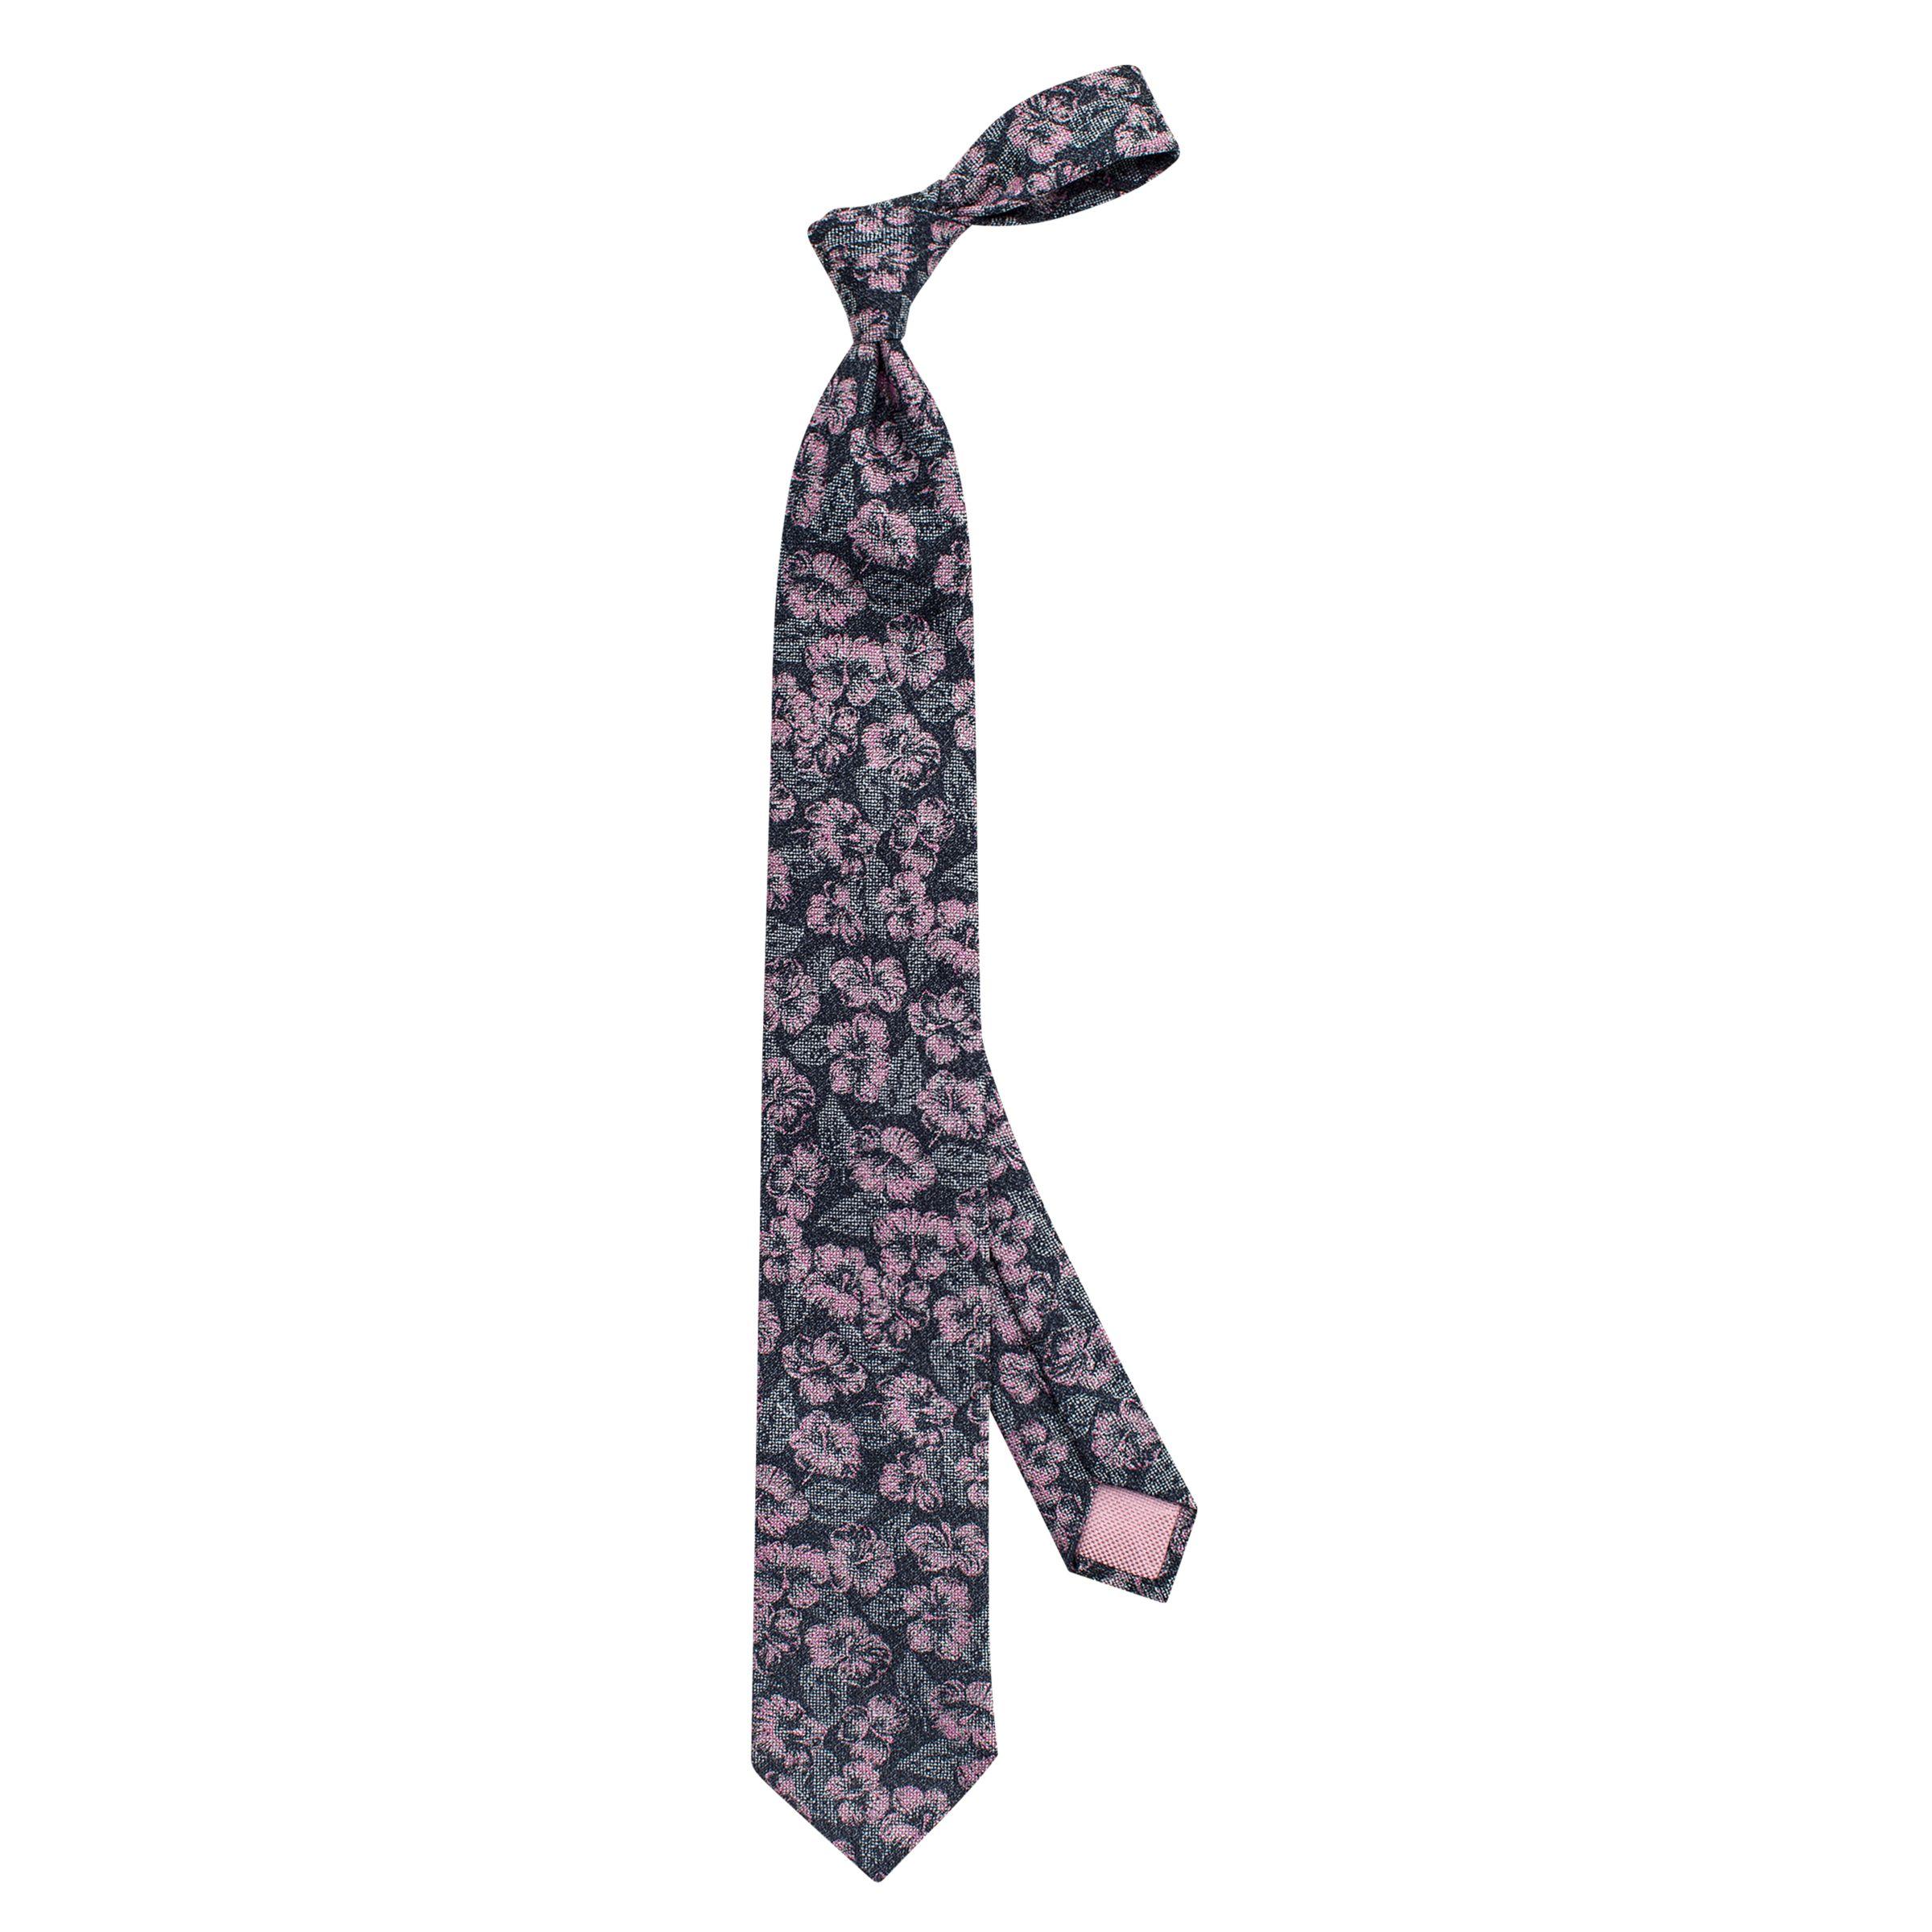 Thomas Pink Thomas Pink Hiddleston Flower Woven Tie, Navy/Red